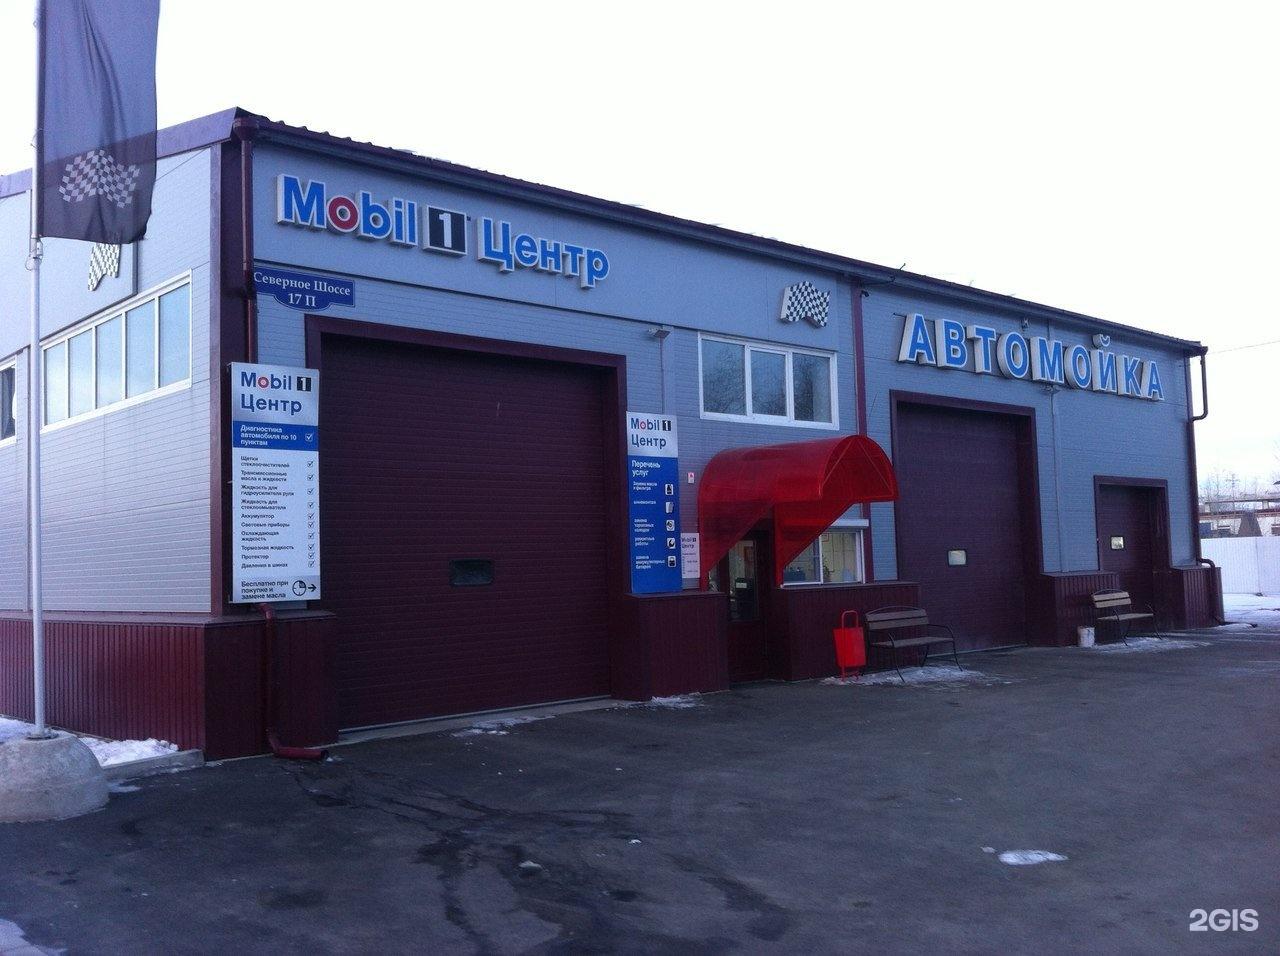 e92.ru онлайн-рынок автозапчастей красноярск.